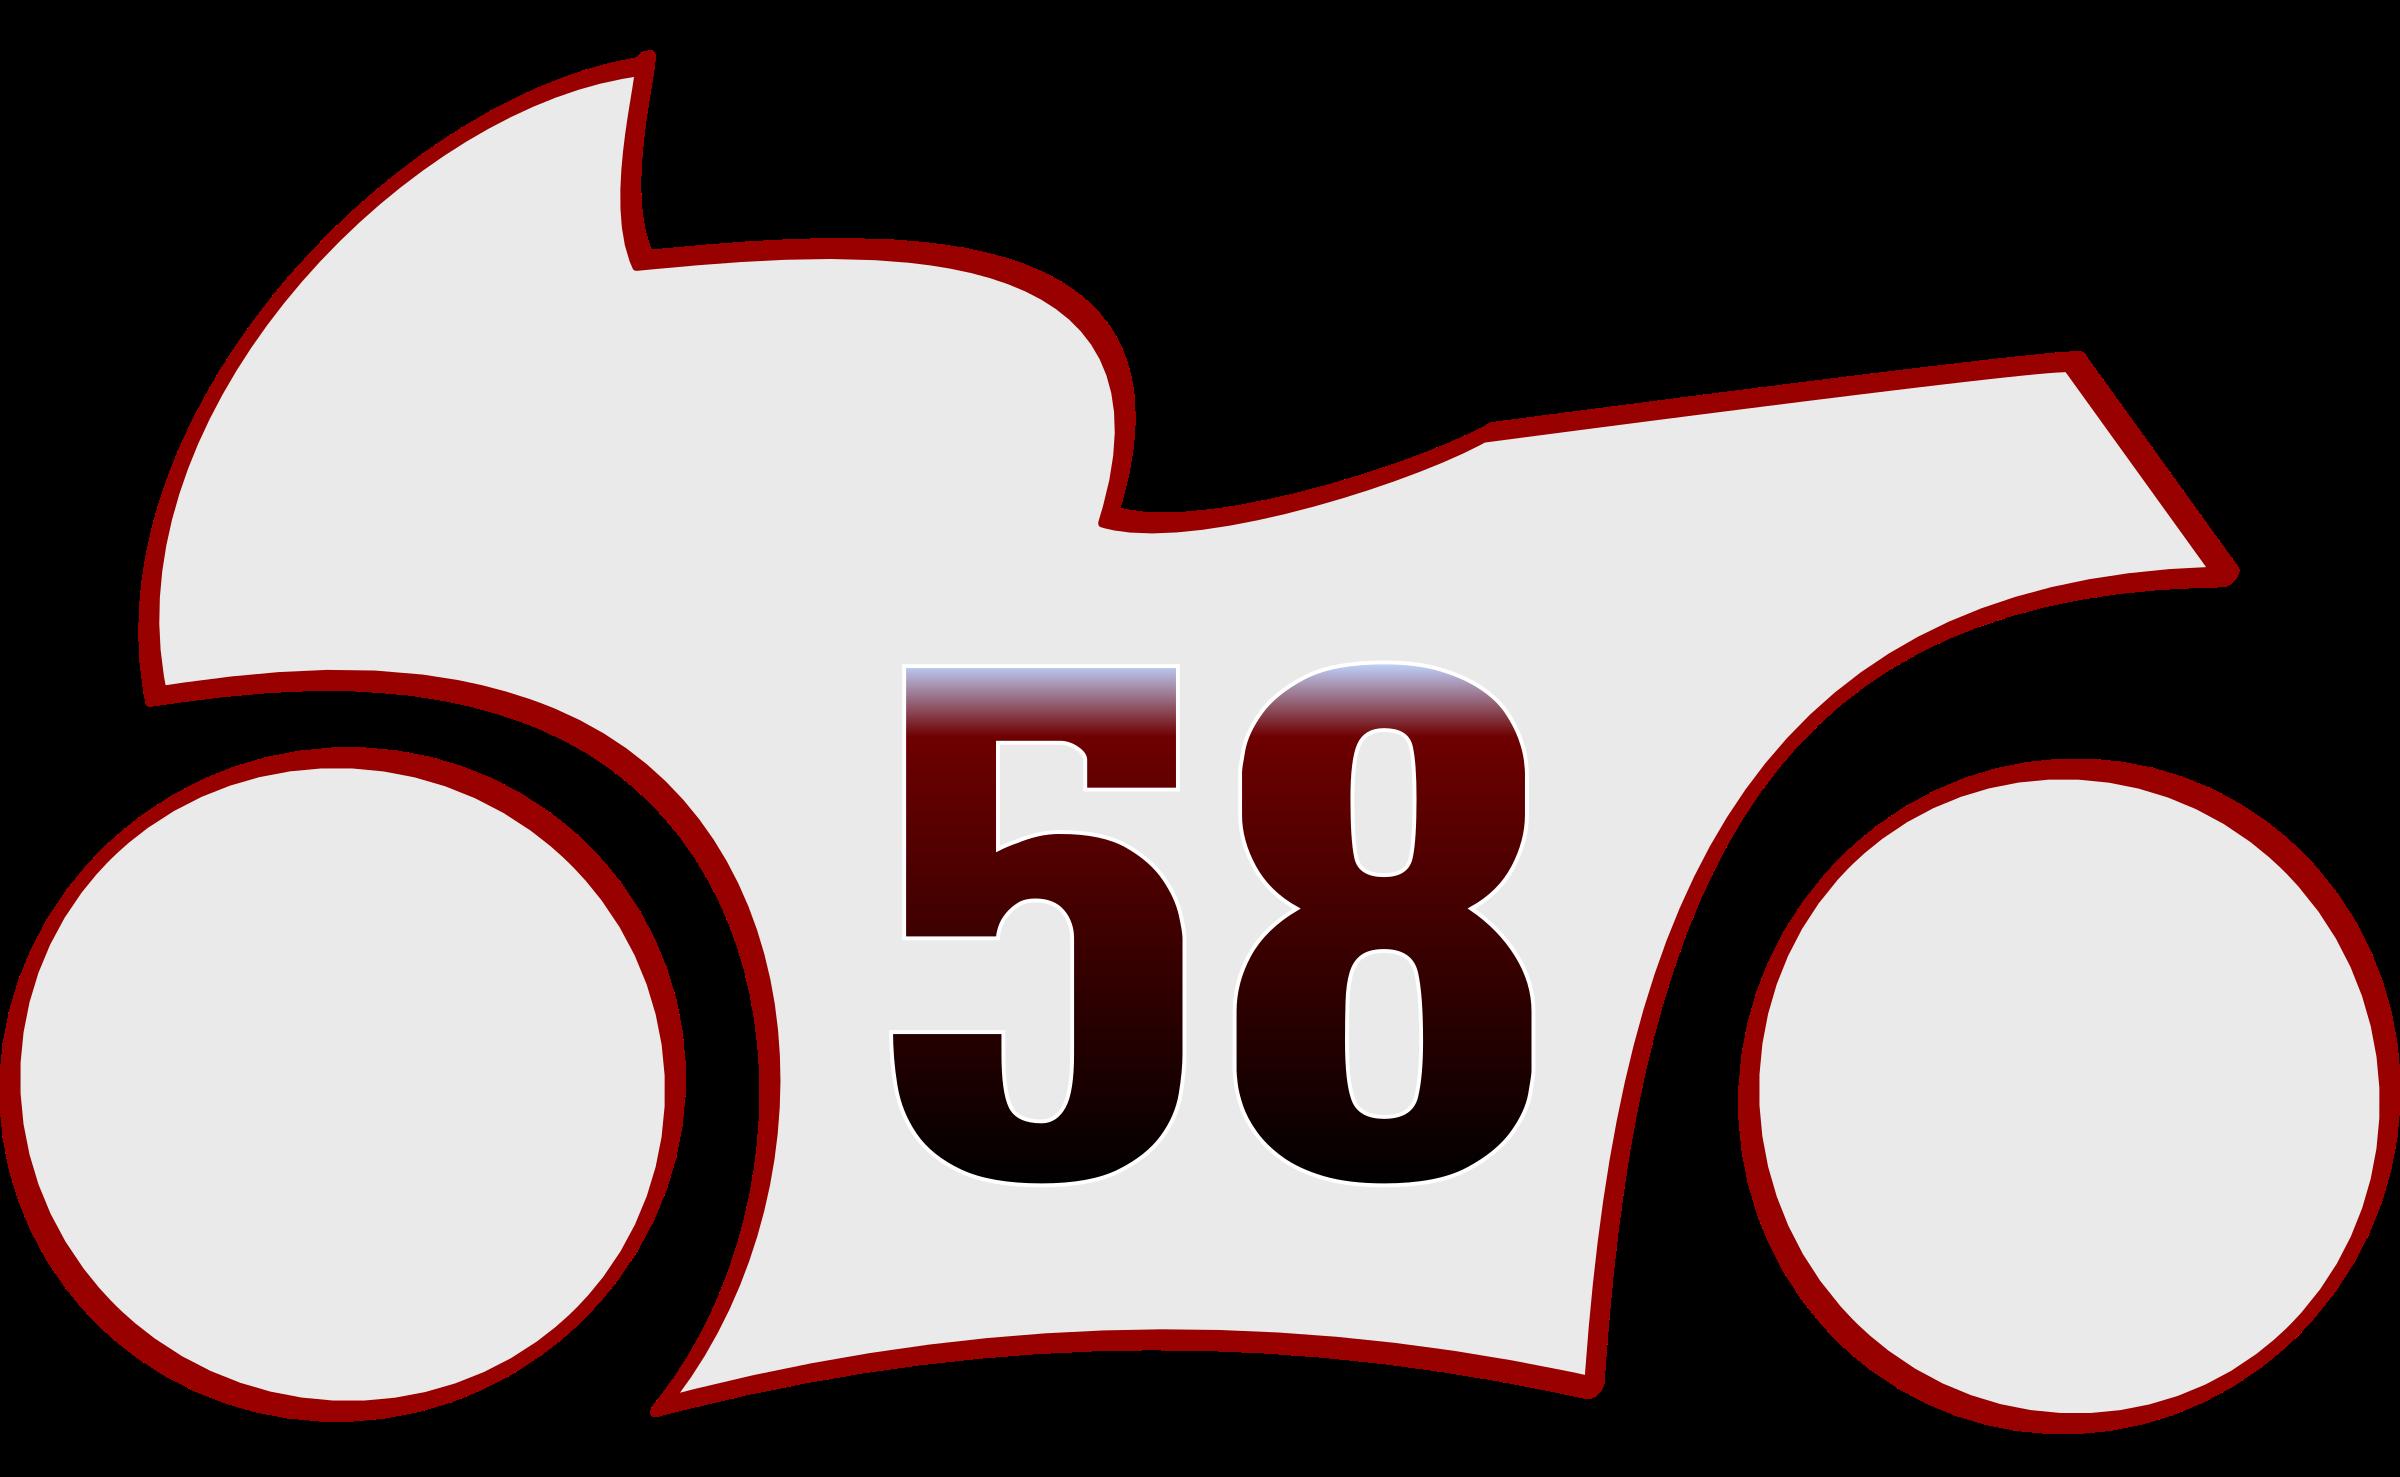 Clipart - stylized marco Simoncelli motoGP